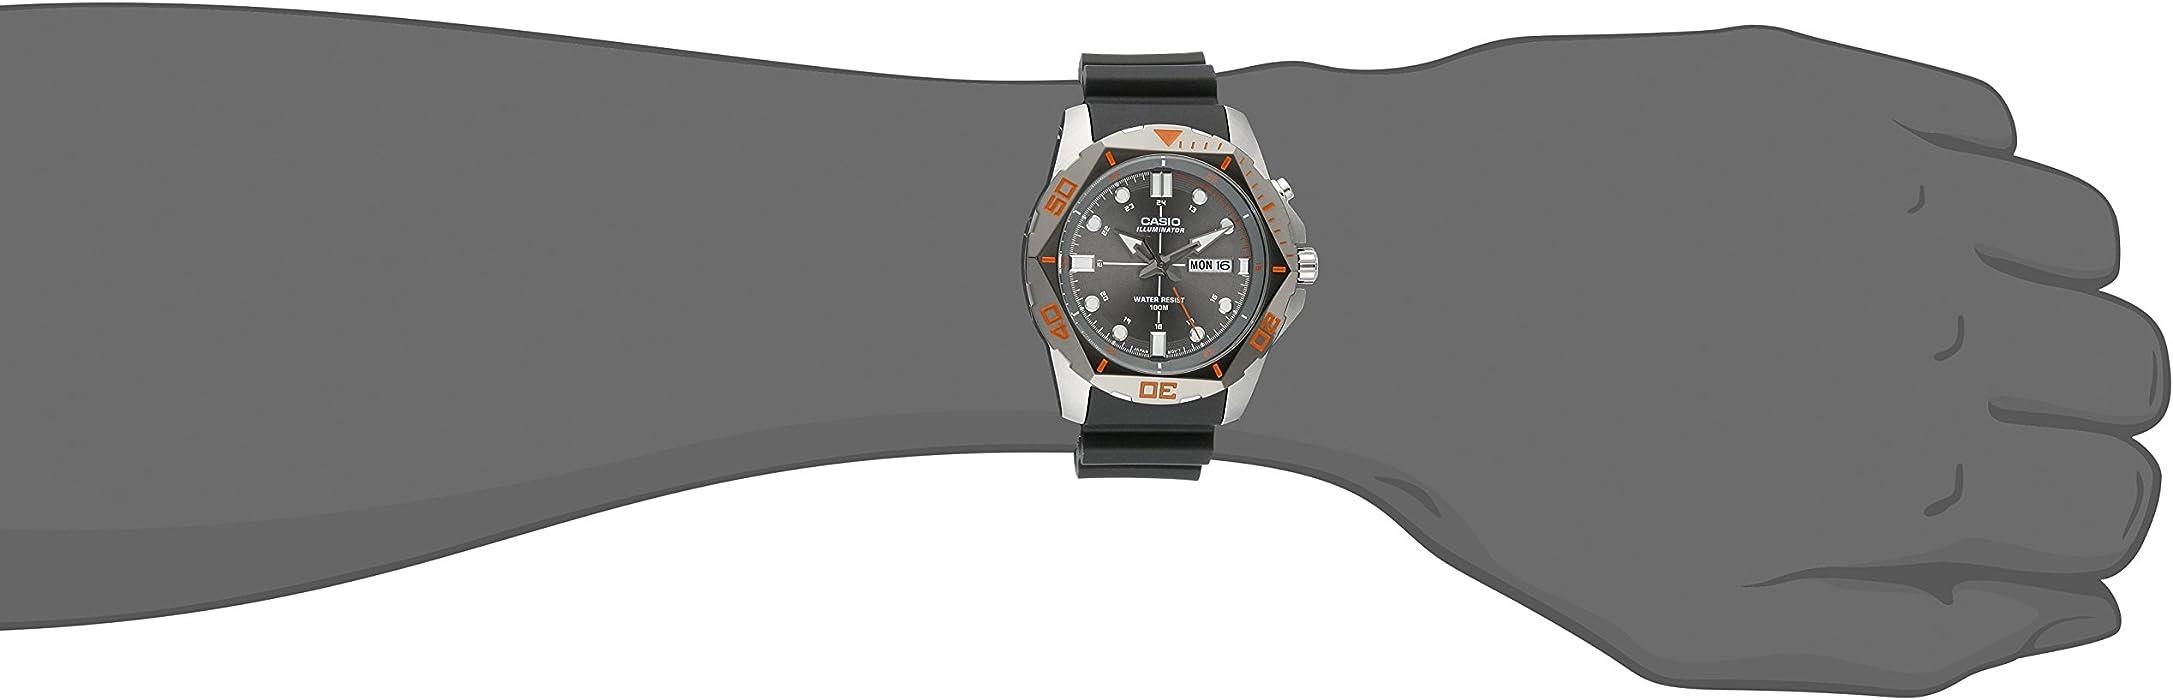 Mens MTD-1080-8AVCF Super Illuminator Diver Analog Display Quartz Black Watch